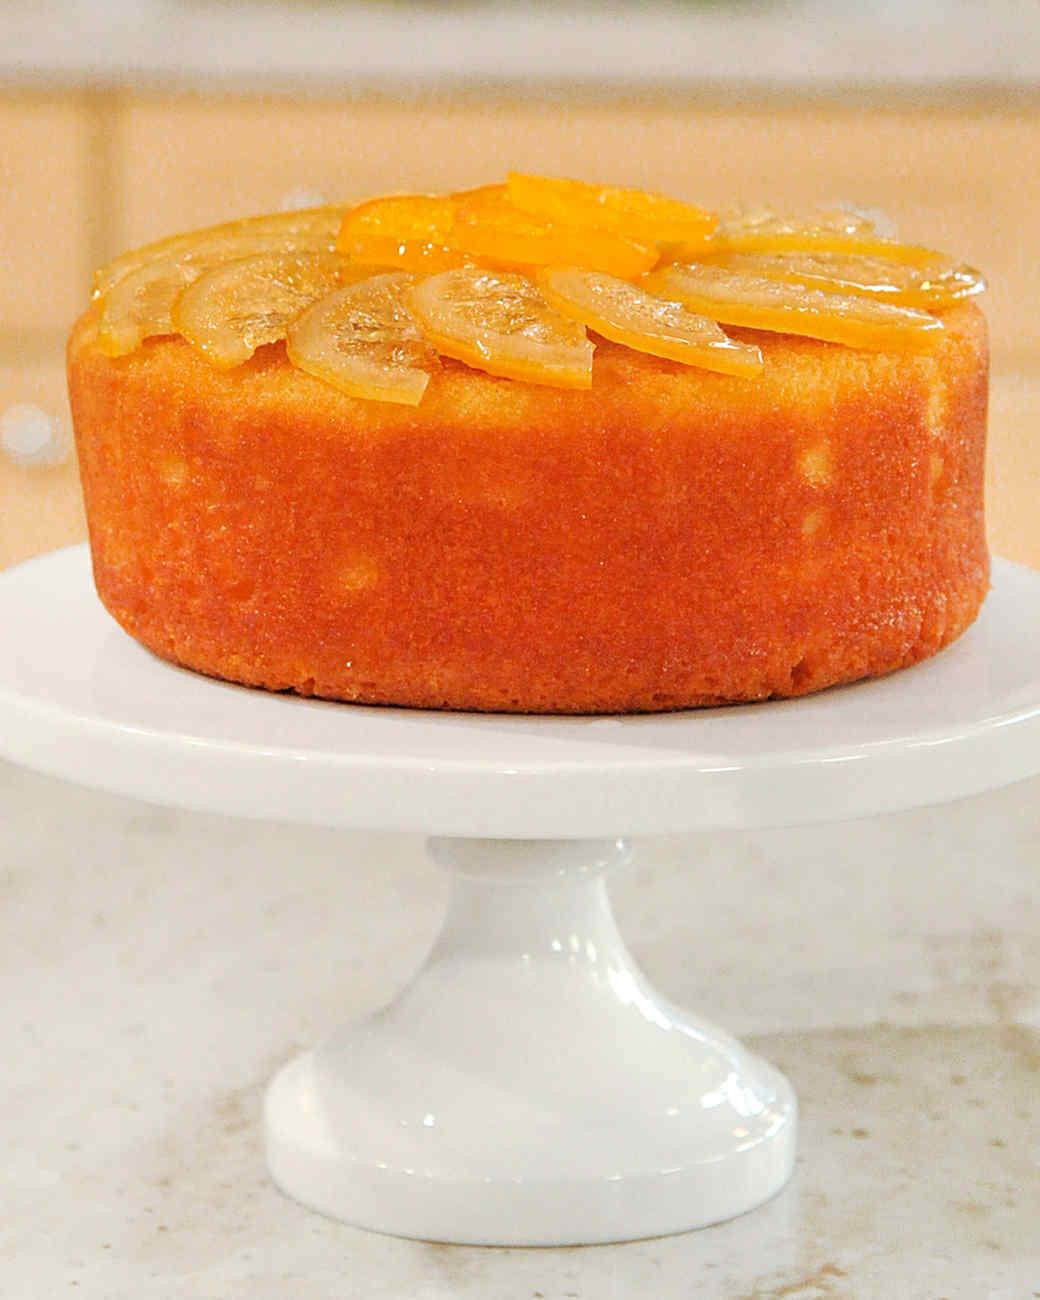 Wedding Cake Recipes Martha Stewart  Sour Lemon Cake Recipe & Video